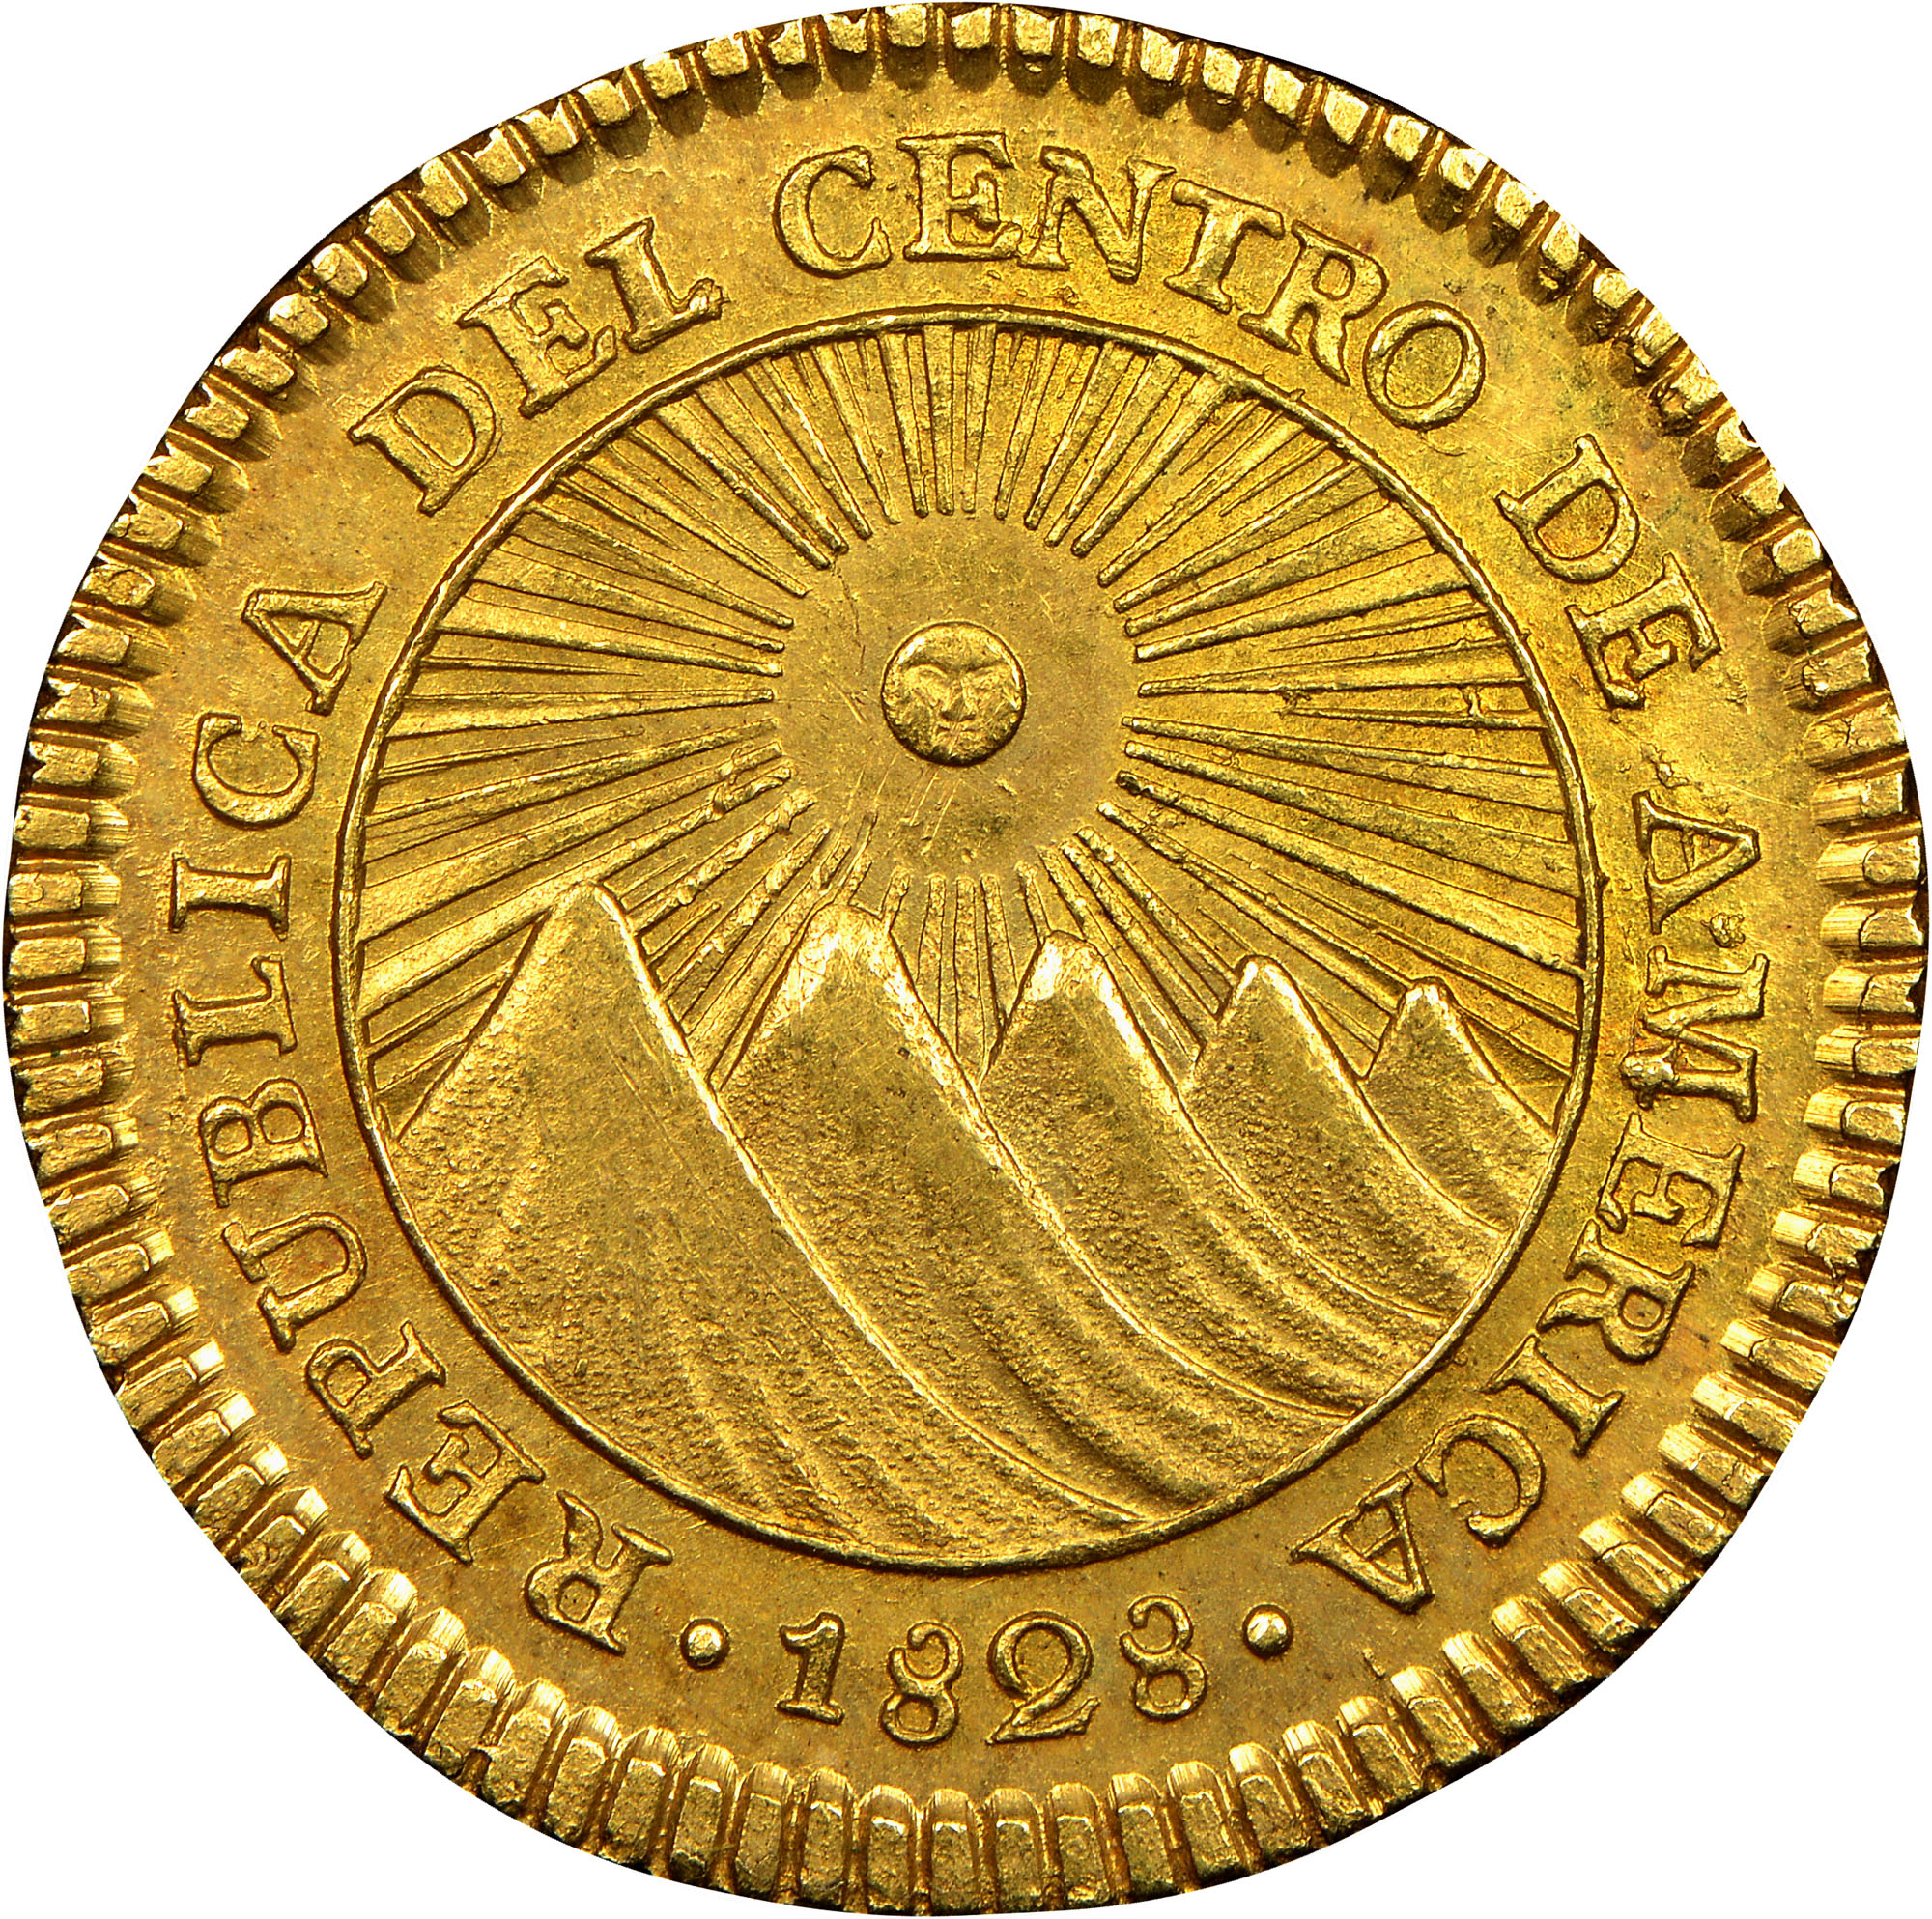 1828-1850 Central American Republic 2 Escudos obverse